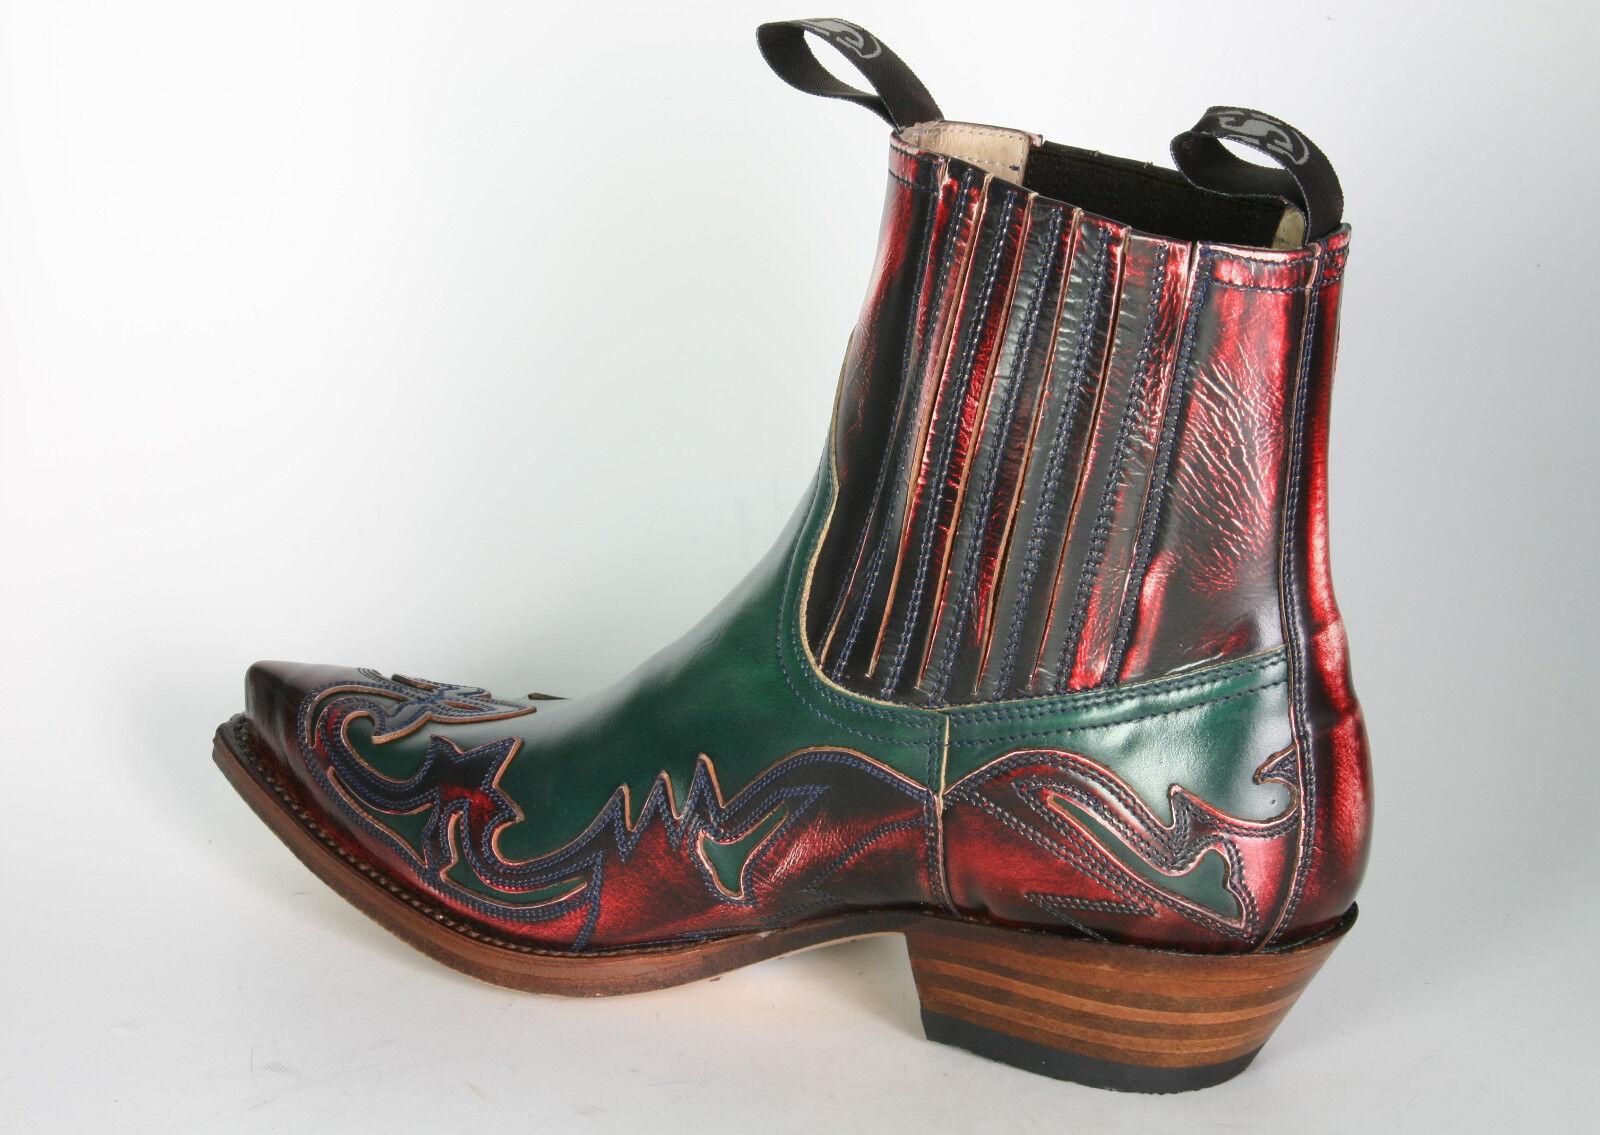 4660 Sendra Stiefeletten Denver Rojo Flor. Verde Cowboystiefel Cowboystiefel Cowboystiefel 1043d7